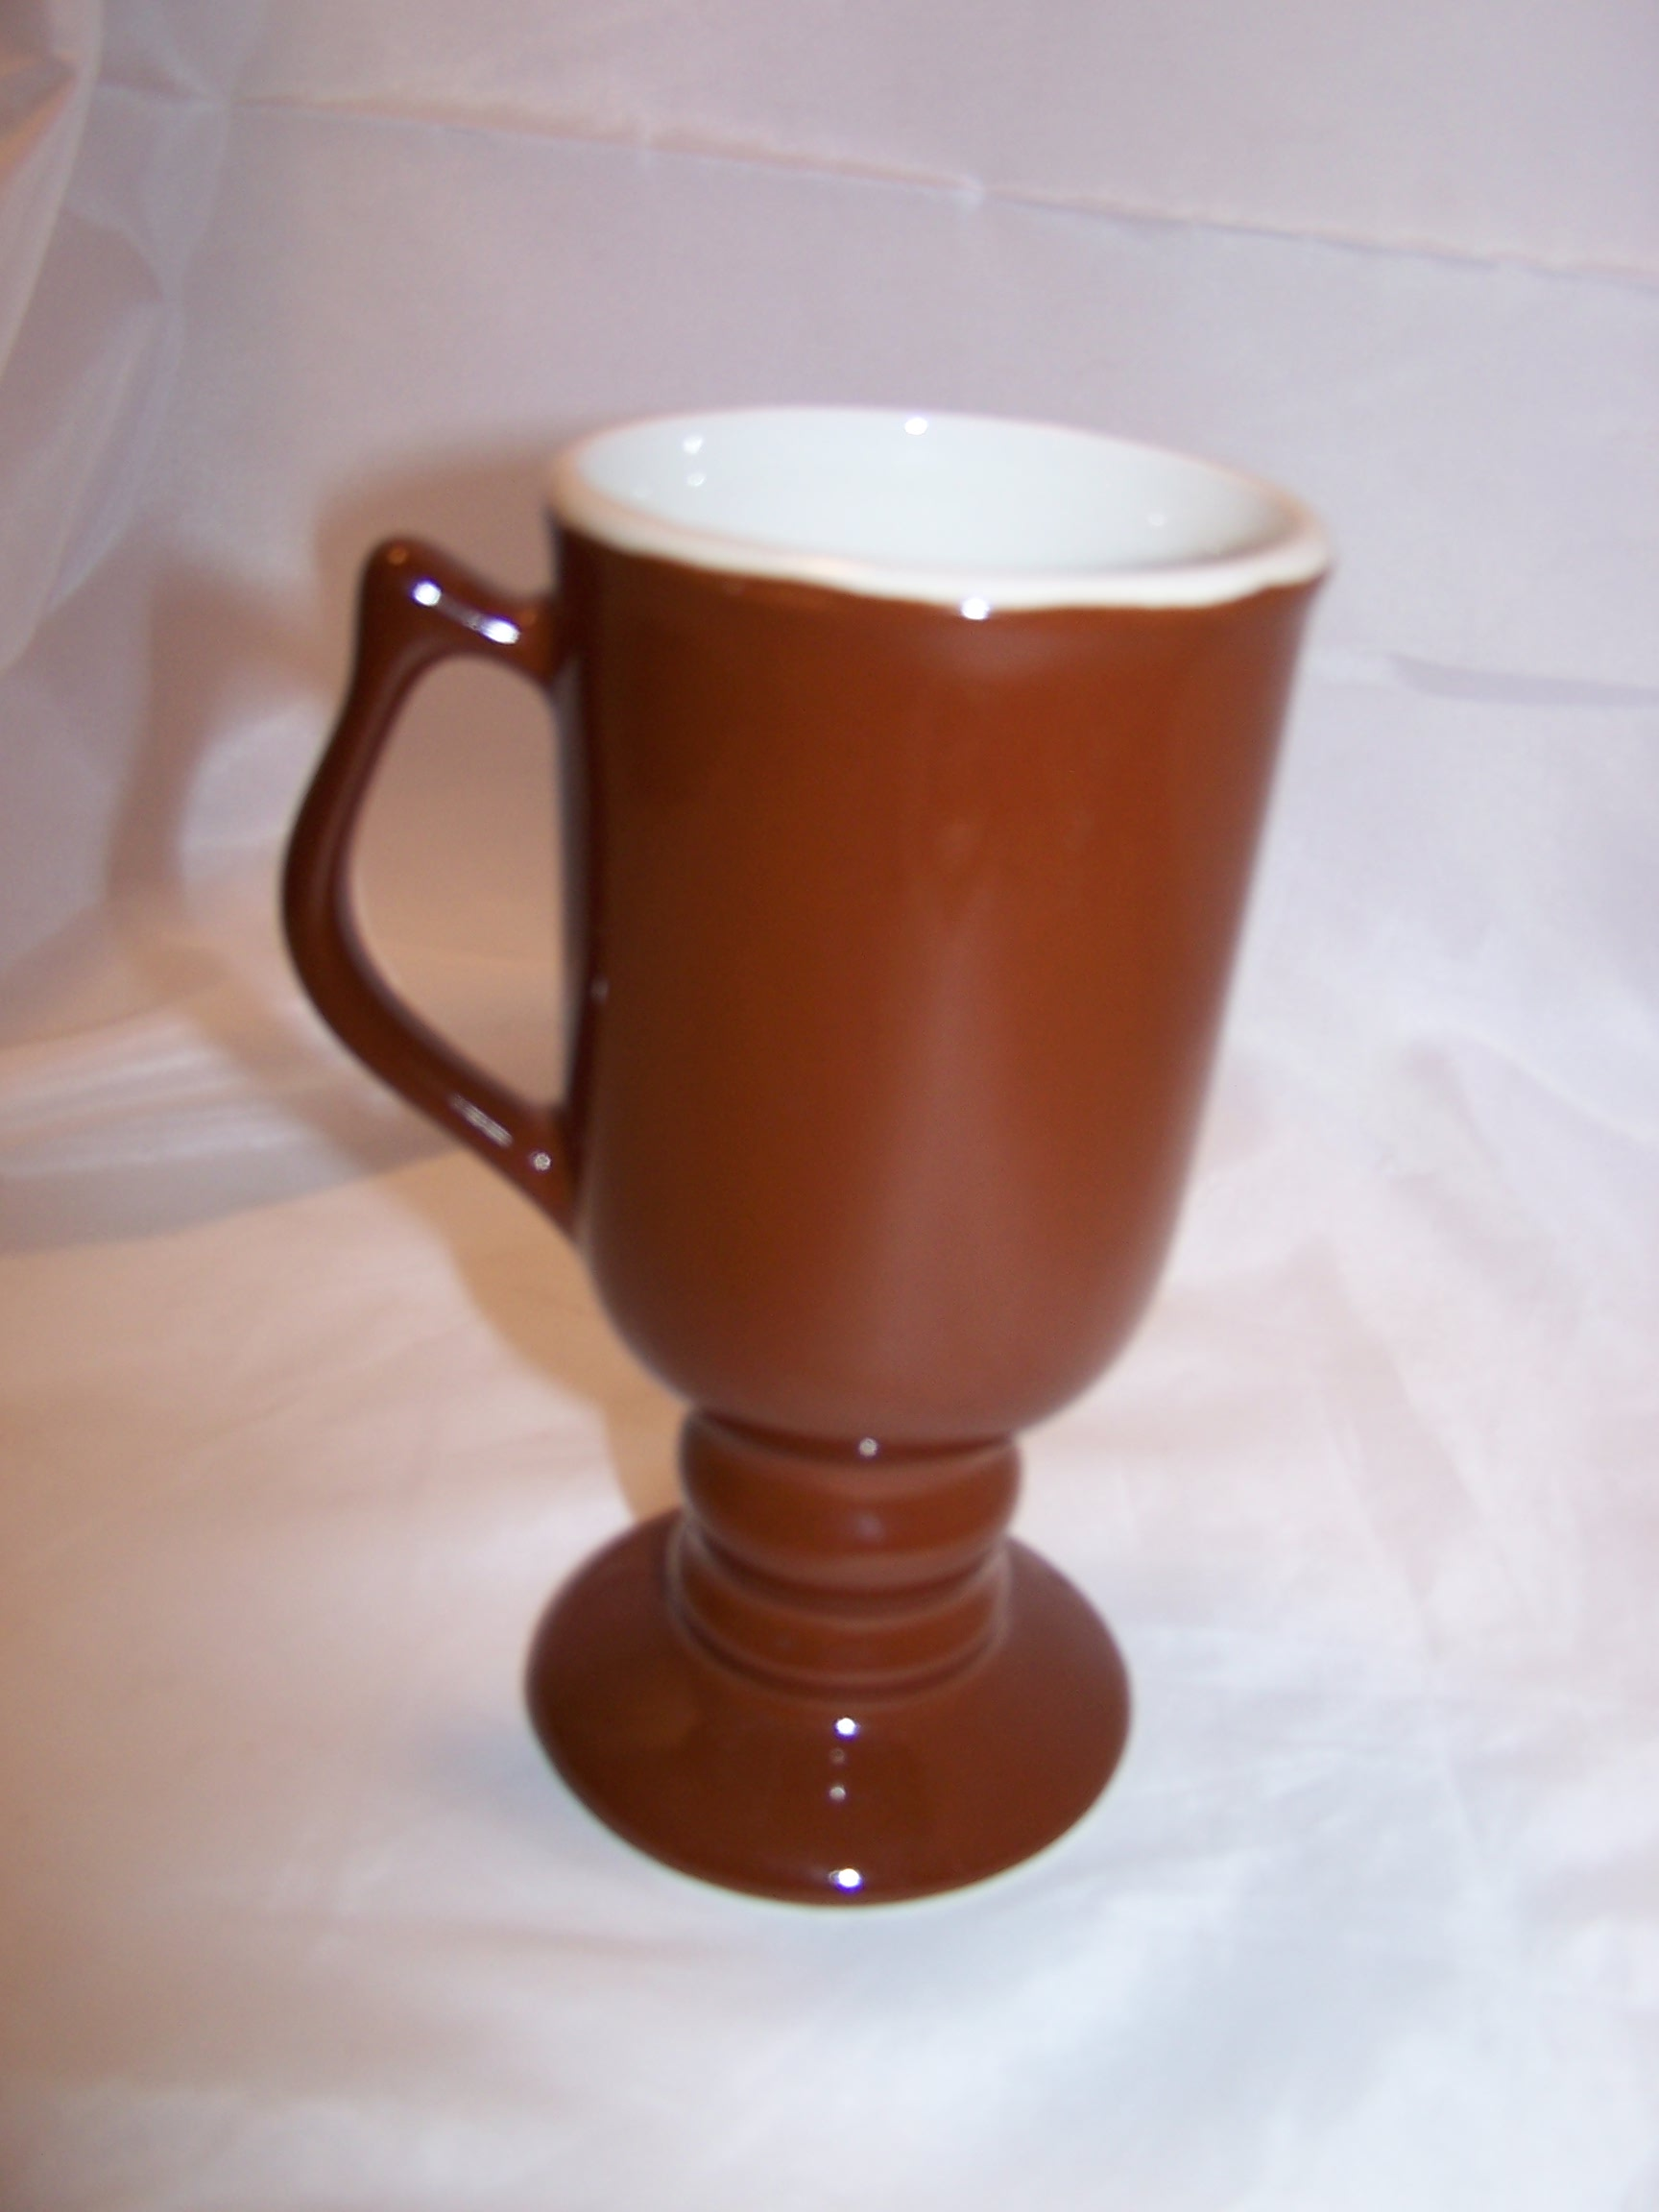 Image 2 of George Steinbrenner Mug, The Pewter Mug Restaurant